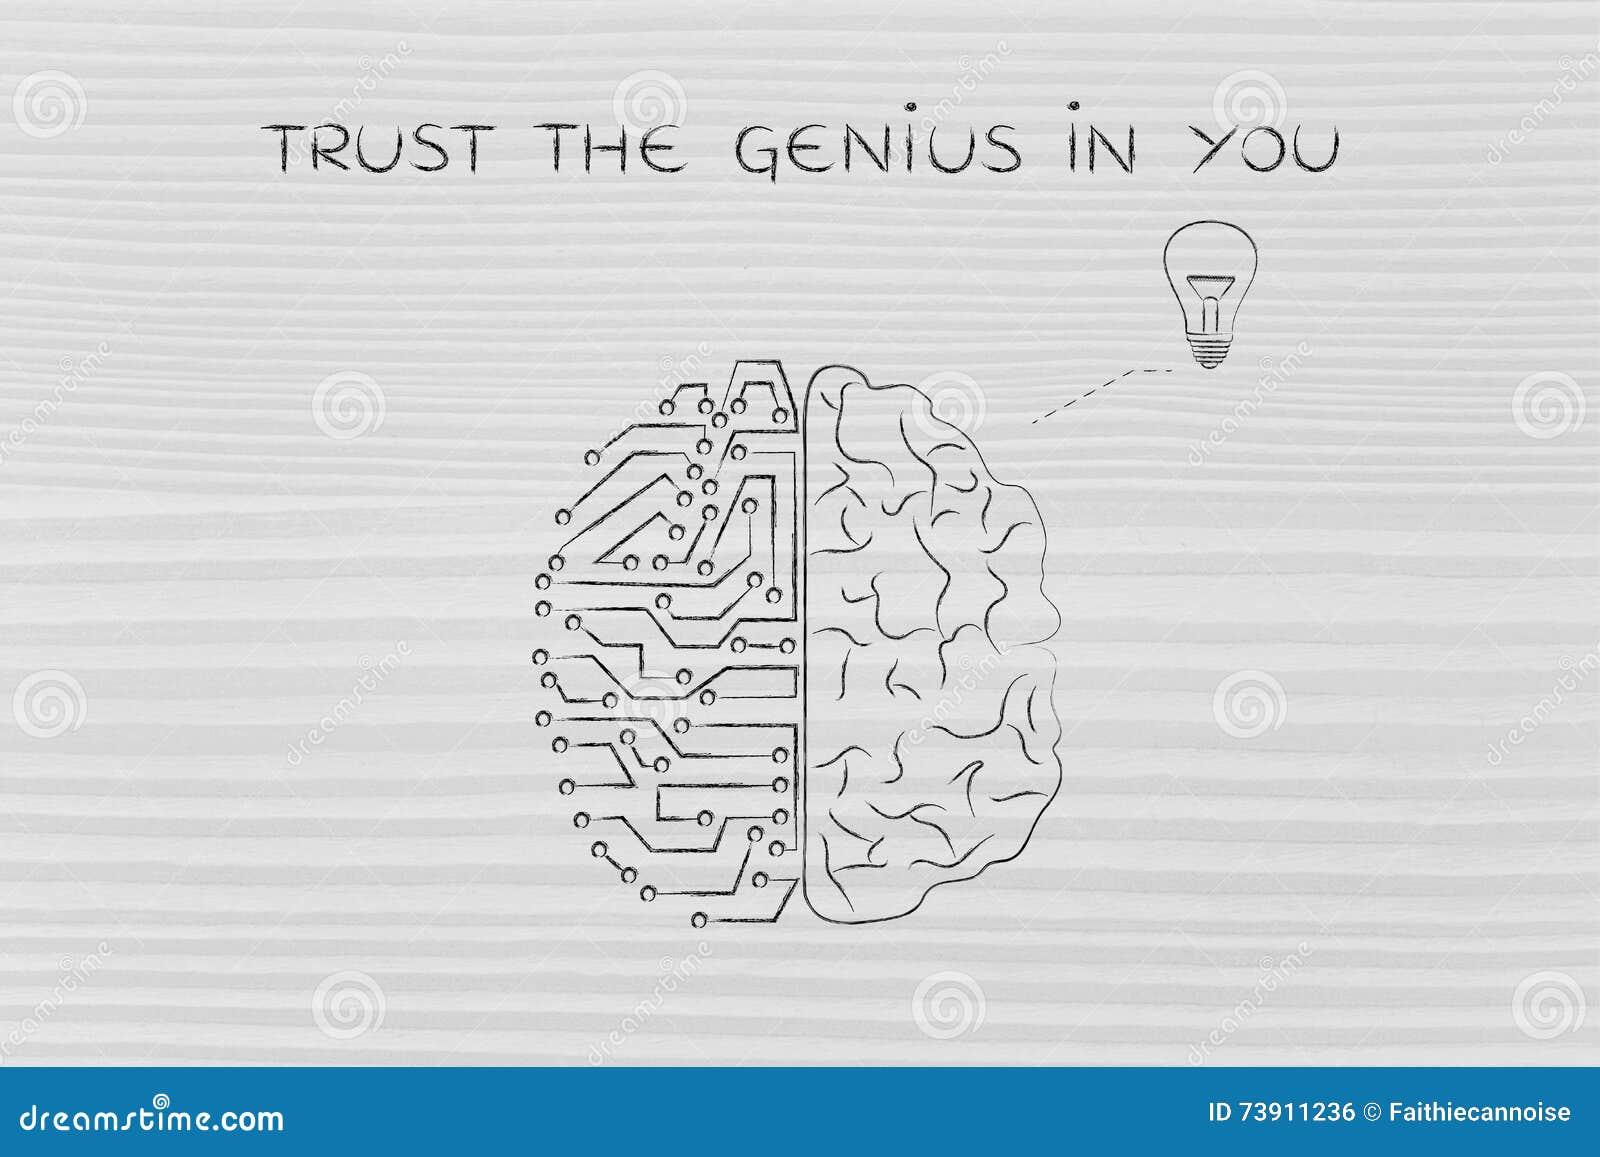 Human And Circuit Brain Having An Idea Trust The Genius In You Lightbulbsymbolcircuitdiagram Light Bulb Symbol Diagram